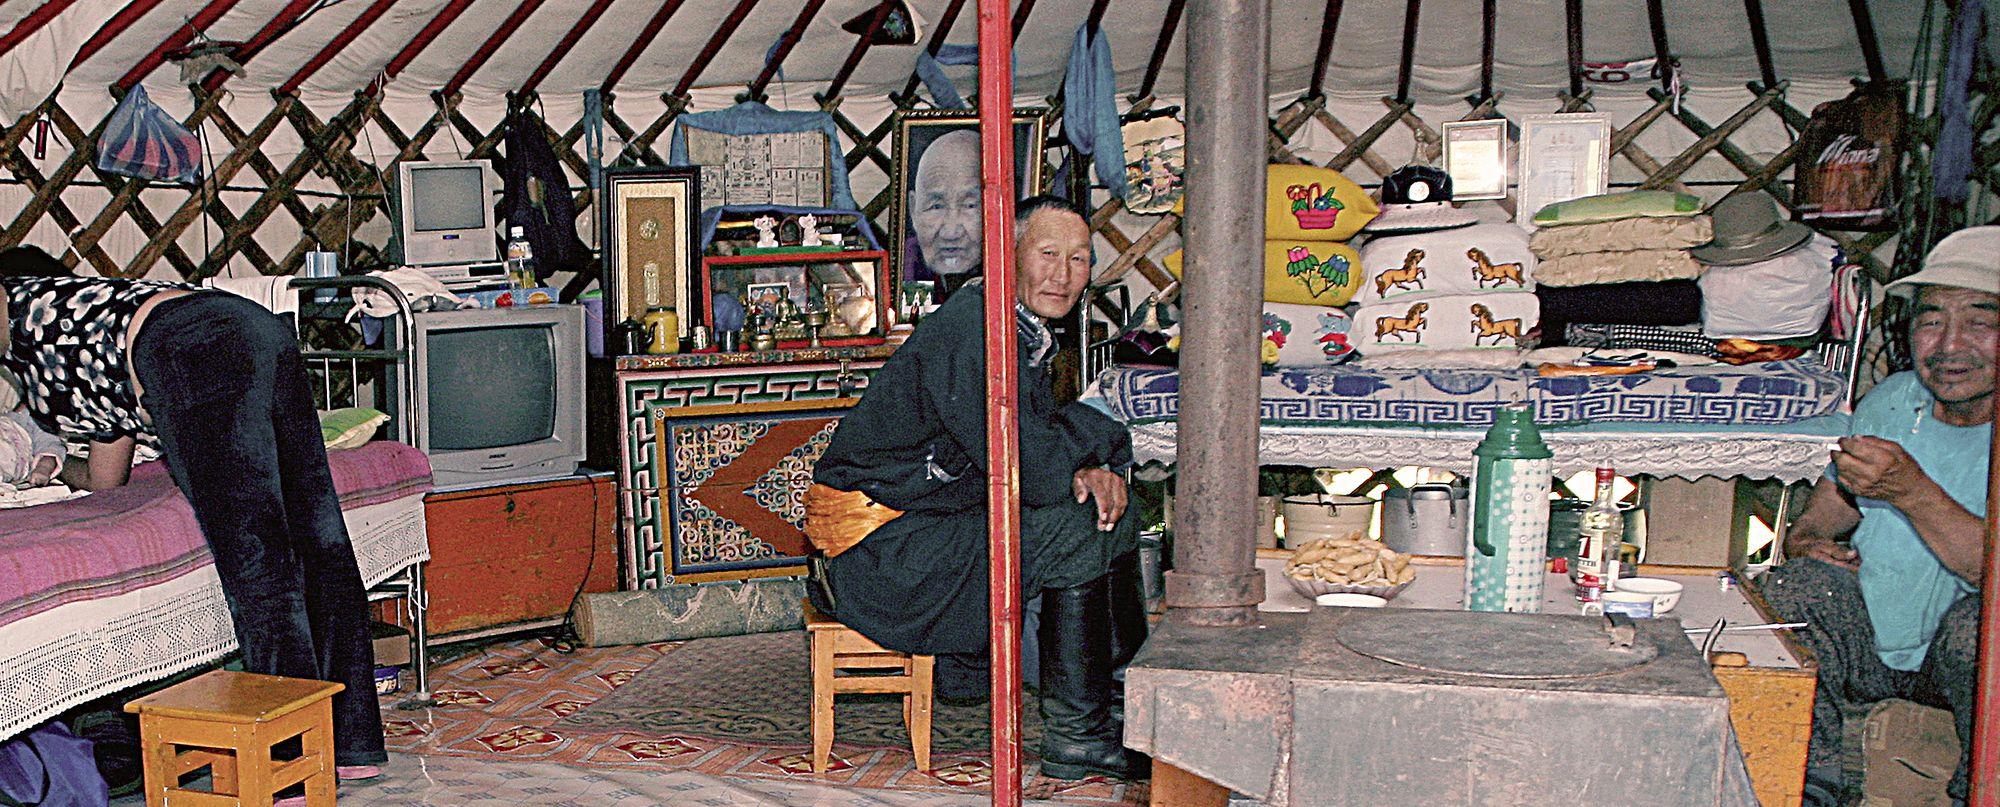 Mongolia -  Desierto de Gobi, Estepa Central y Lago Khovsgol - Salida especial 4-19/sep